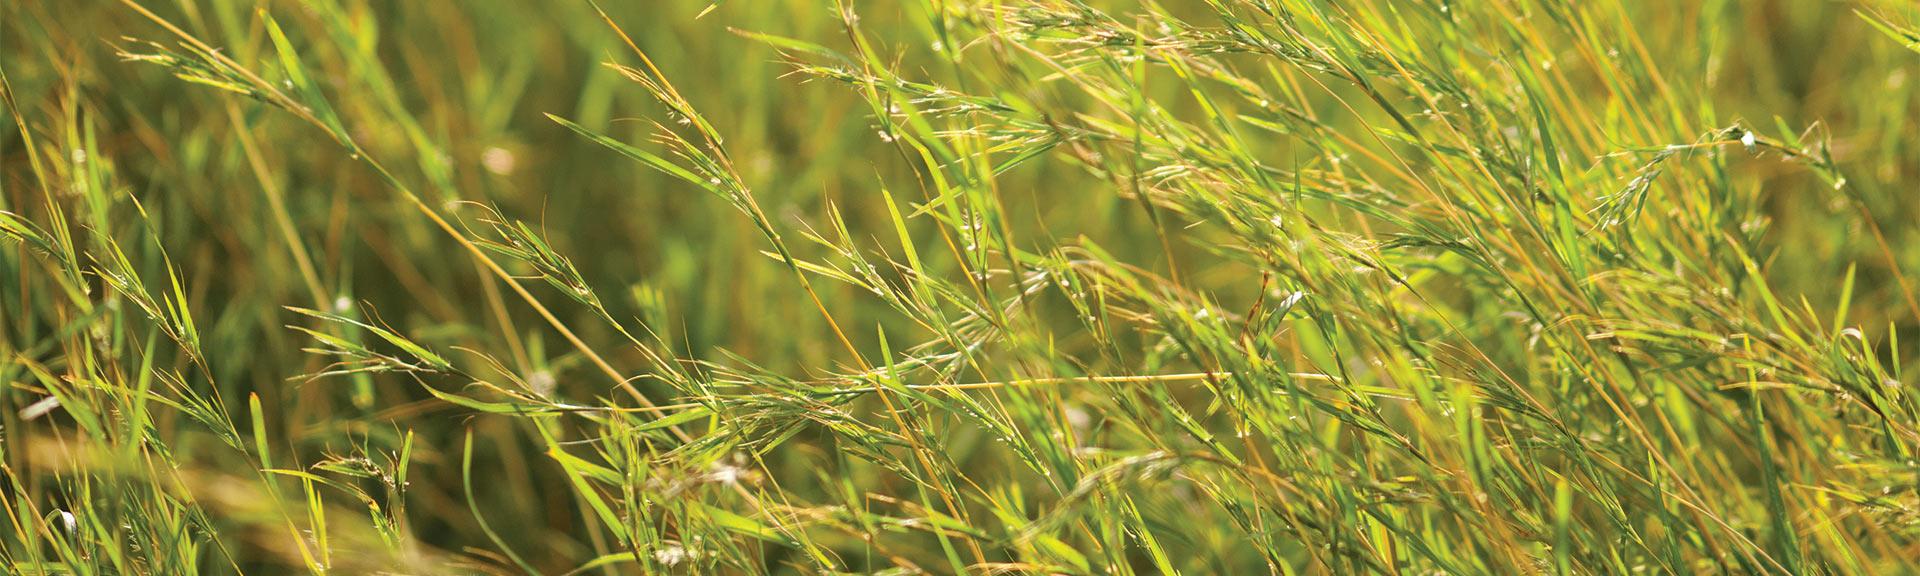 Plateau® Herbicide Control Roadside Grasses | BASF Vegetation